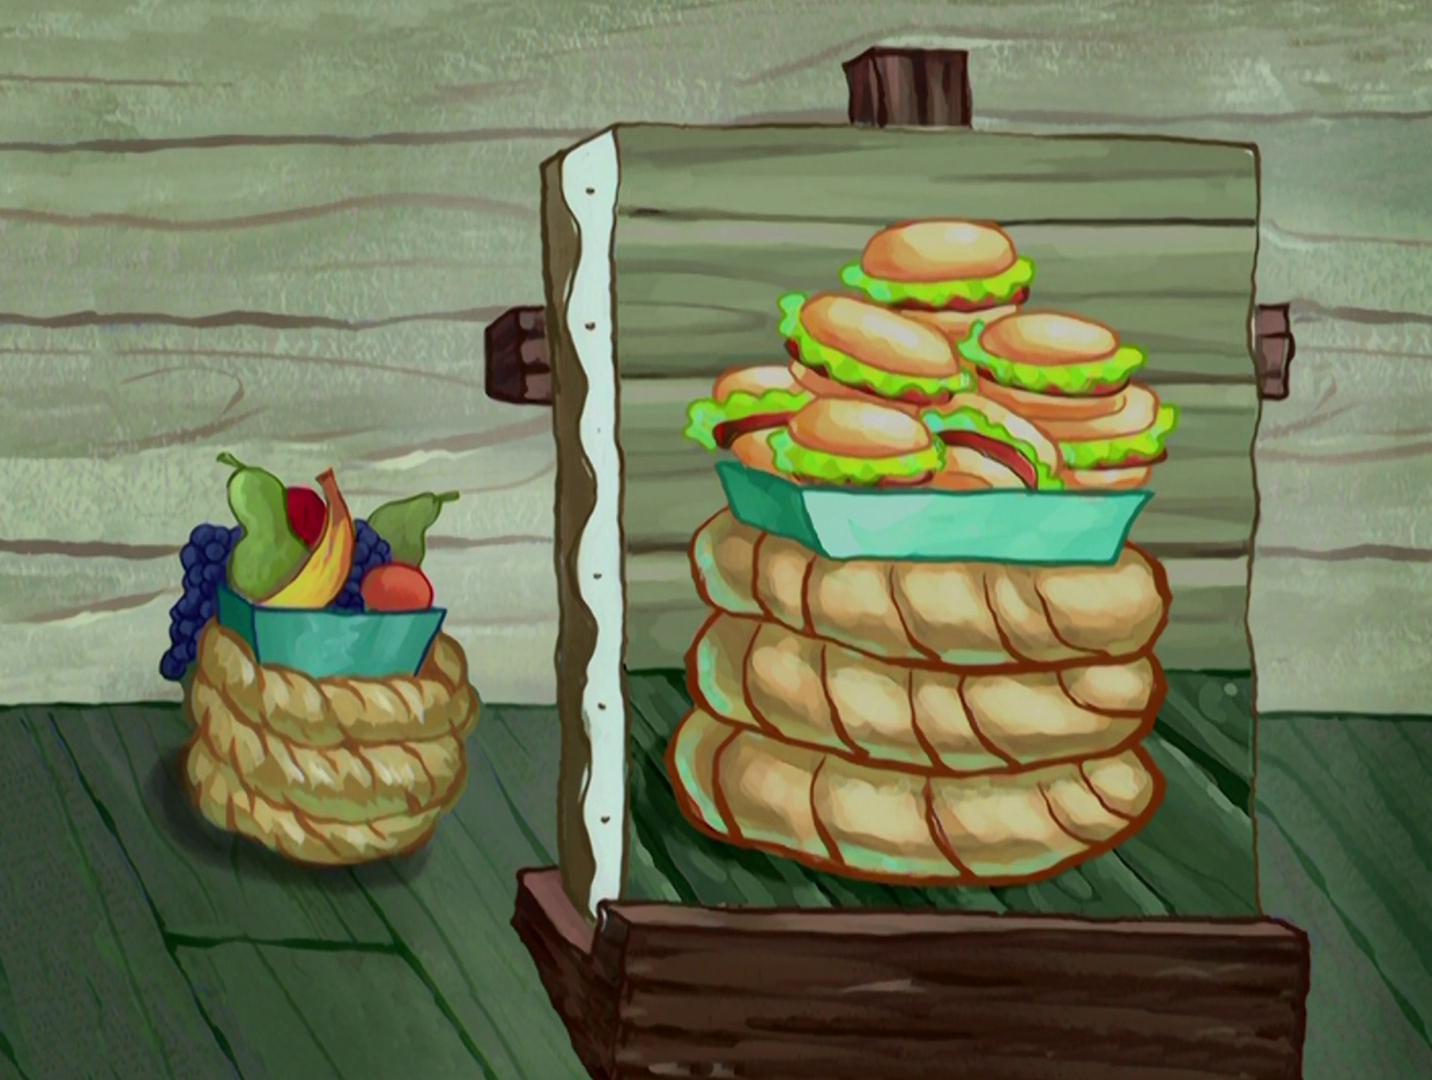 Synthetic Krabby Patty